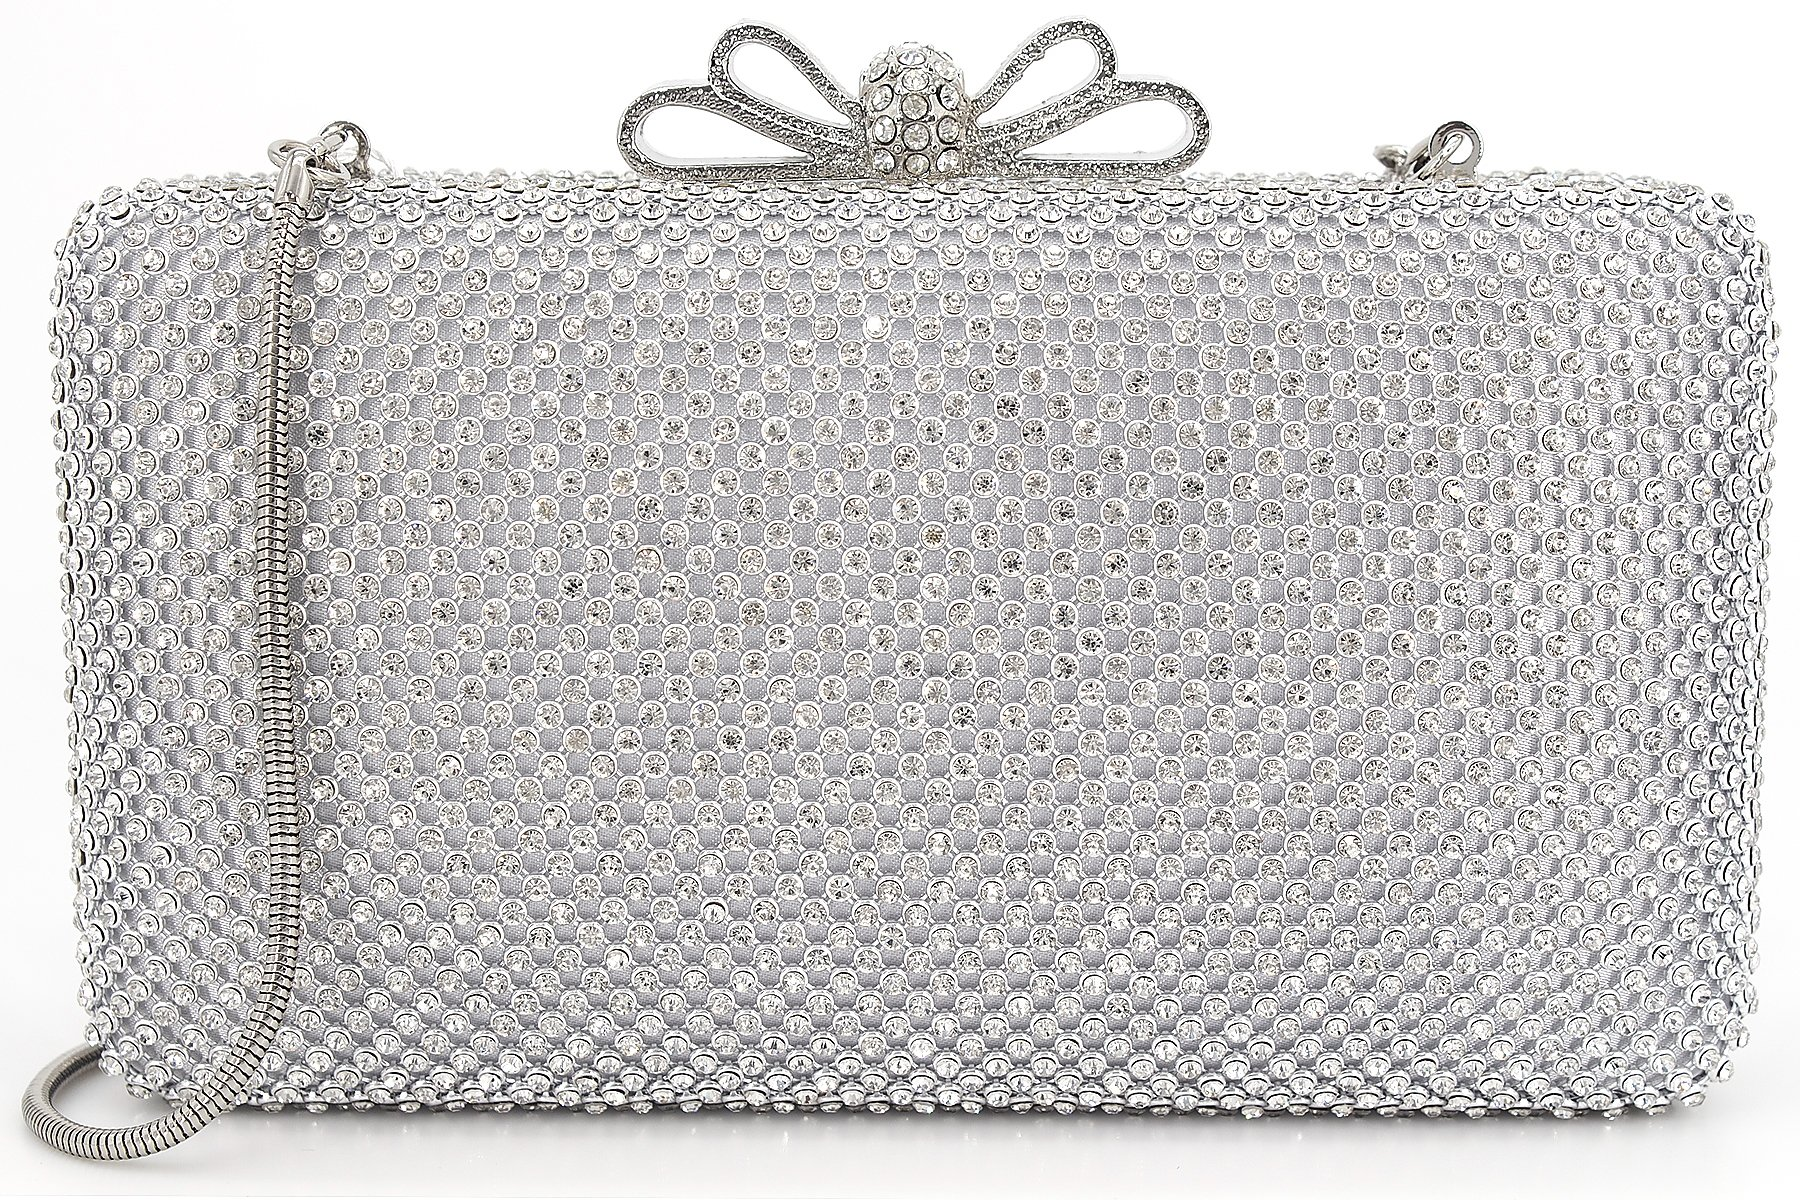 Dexmay Bling Rhinestone Crystal Clutch Purse Bow Clasp Women Evening Bag for Bridesmaid Wedding Party Silver